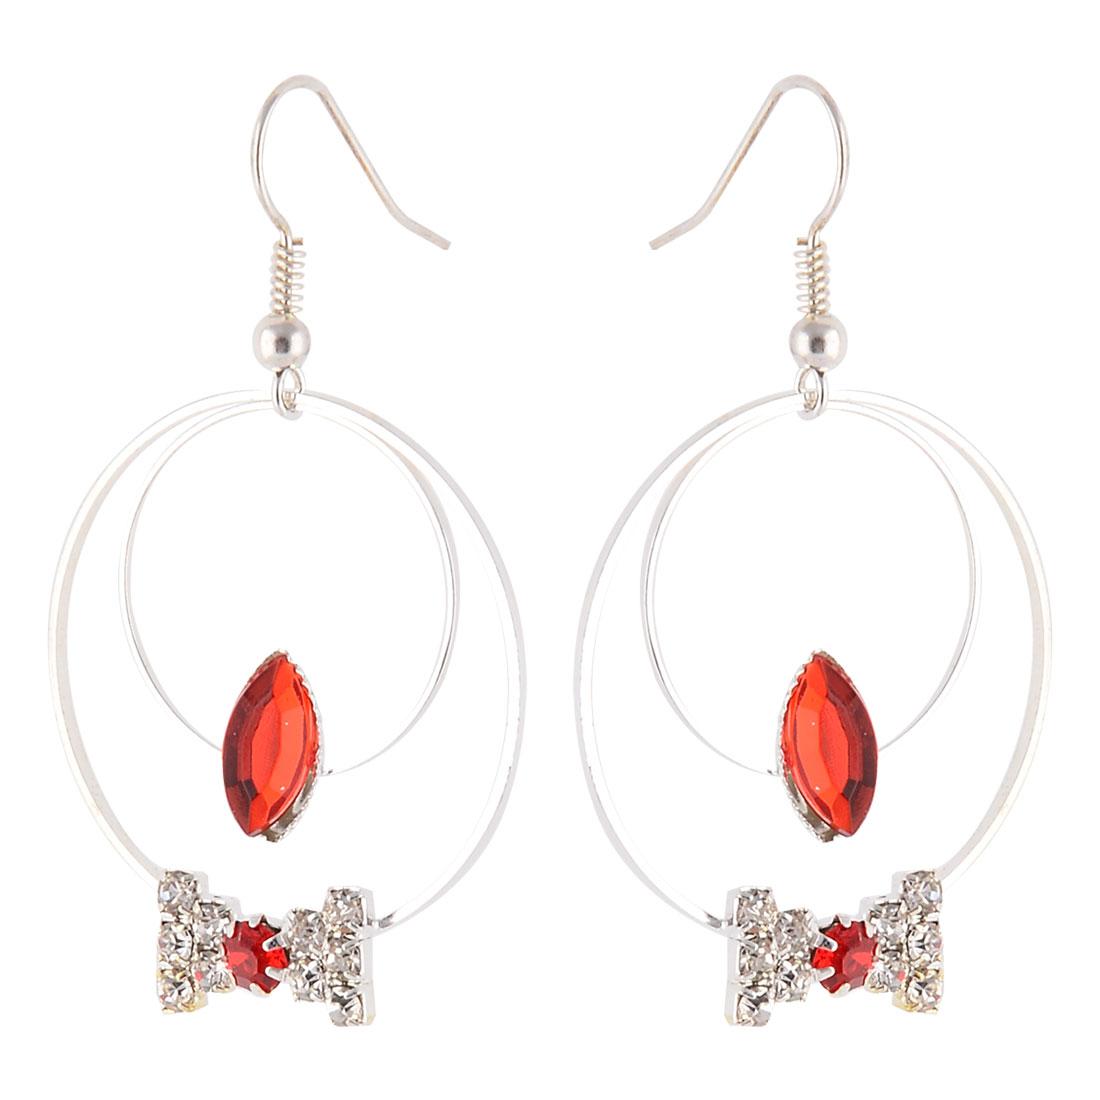 Women Accessory Metal Double Rings Dangling Pendants Ornament Hook Earrings Pair